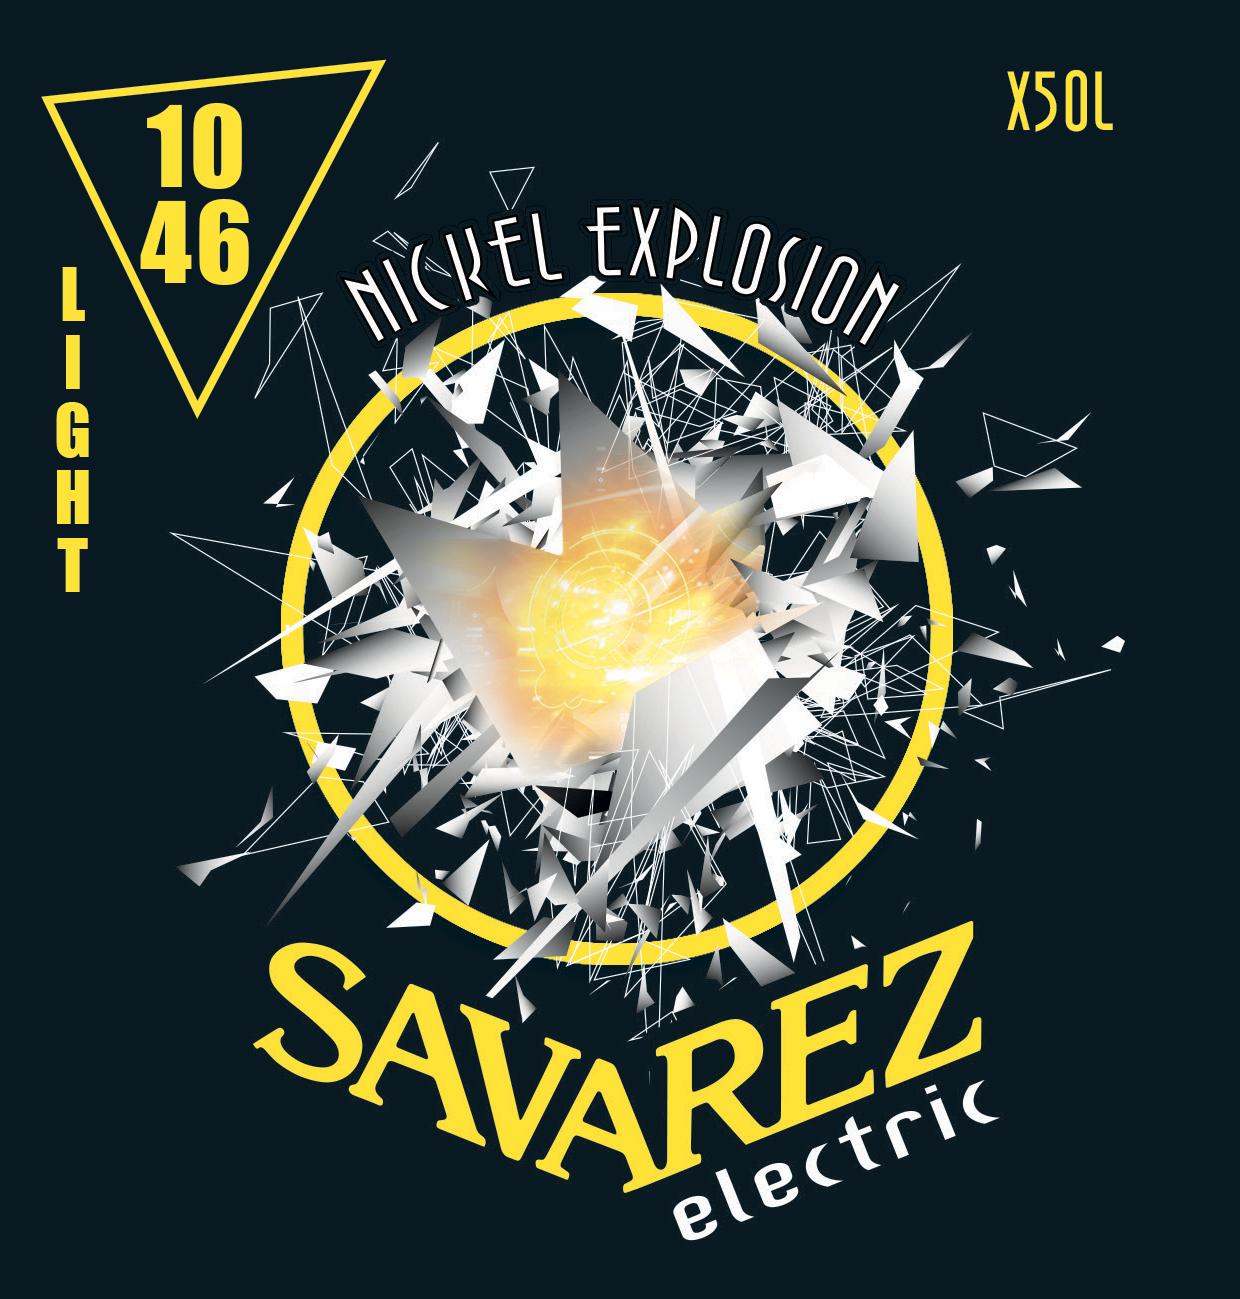 SAVAREZ ELECTRIC NICKEL EXPLOSION X50L